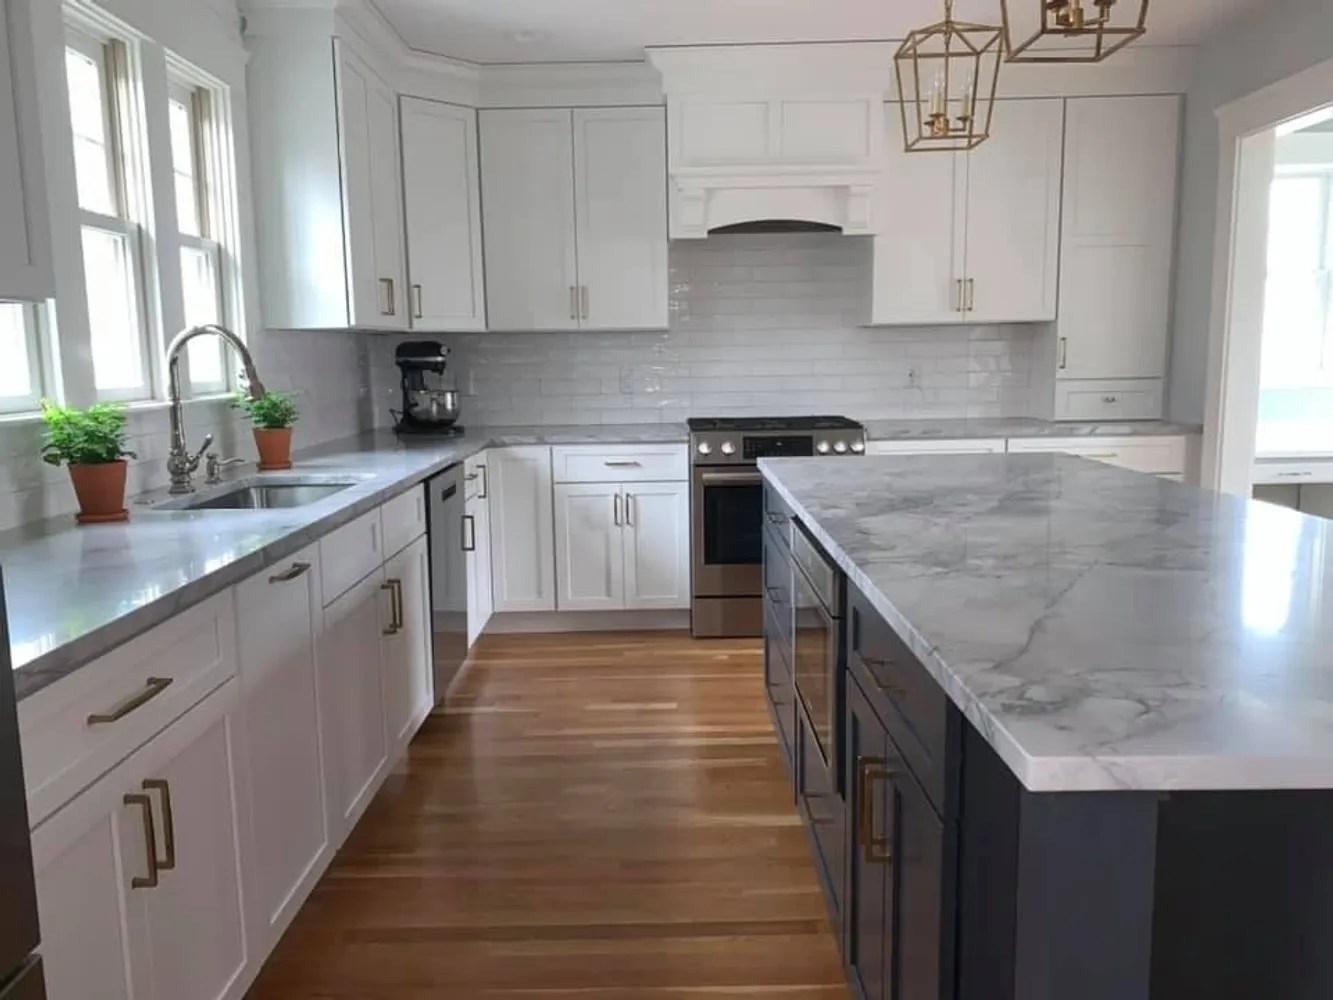 39 CROSBY ST Arlington MA 02474 priceRange. Conneely Contracting Inc Contracting Arlington Massachusetts